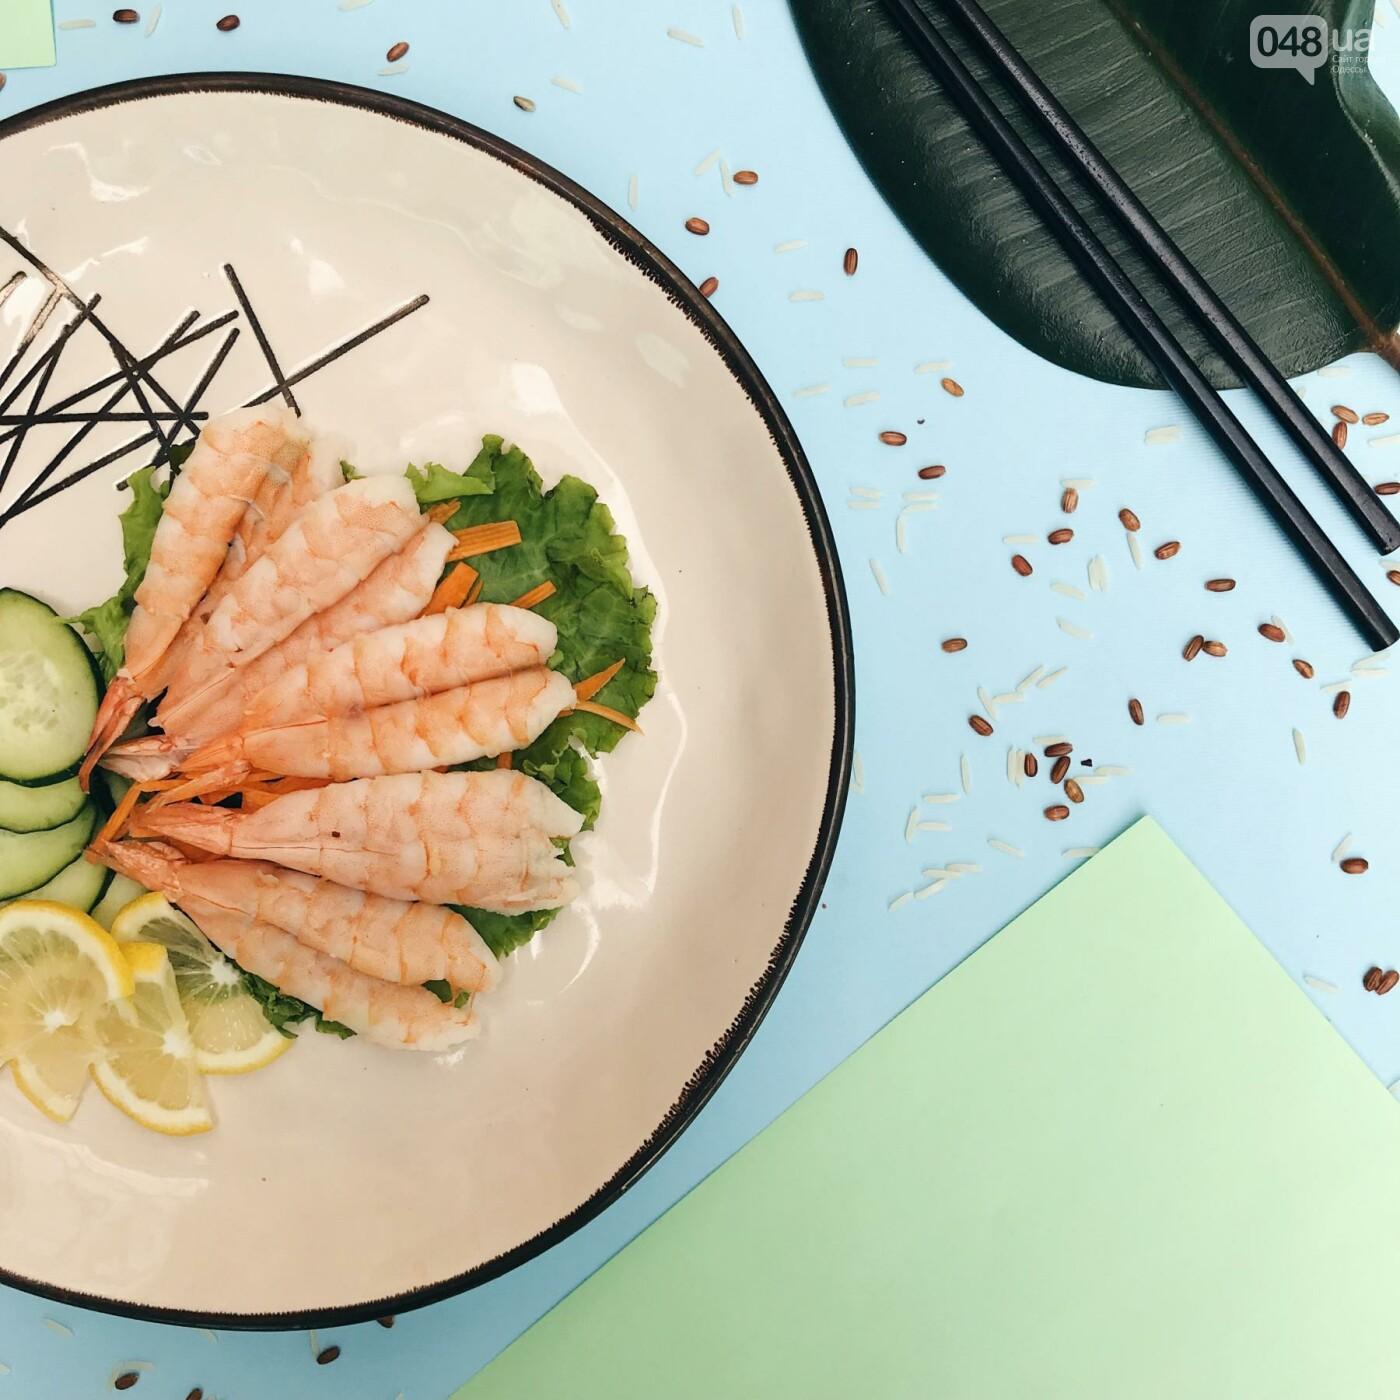 ris.od.ua - японская кухня у вас дома!, фото-5